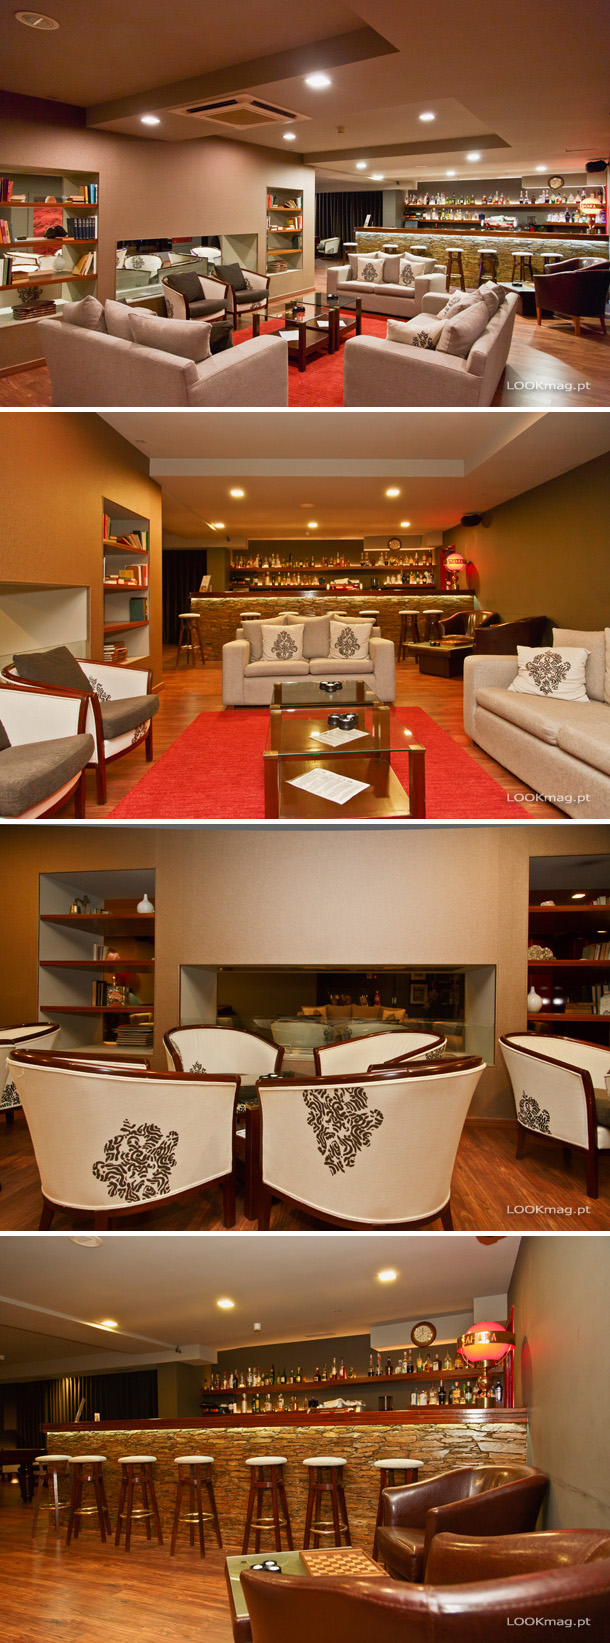 hotel_meira-lookmag_pt-22_25